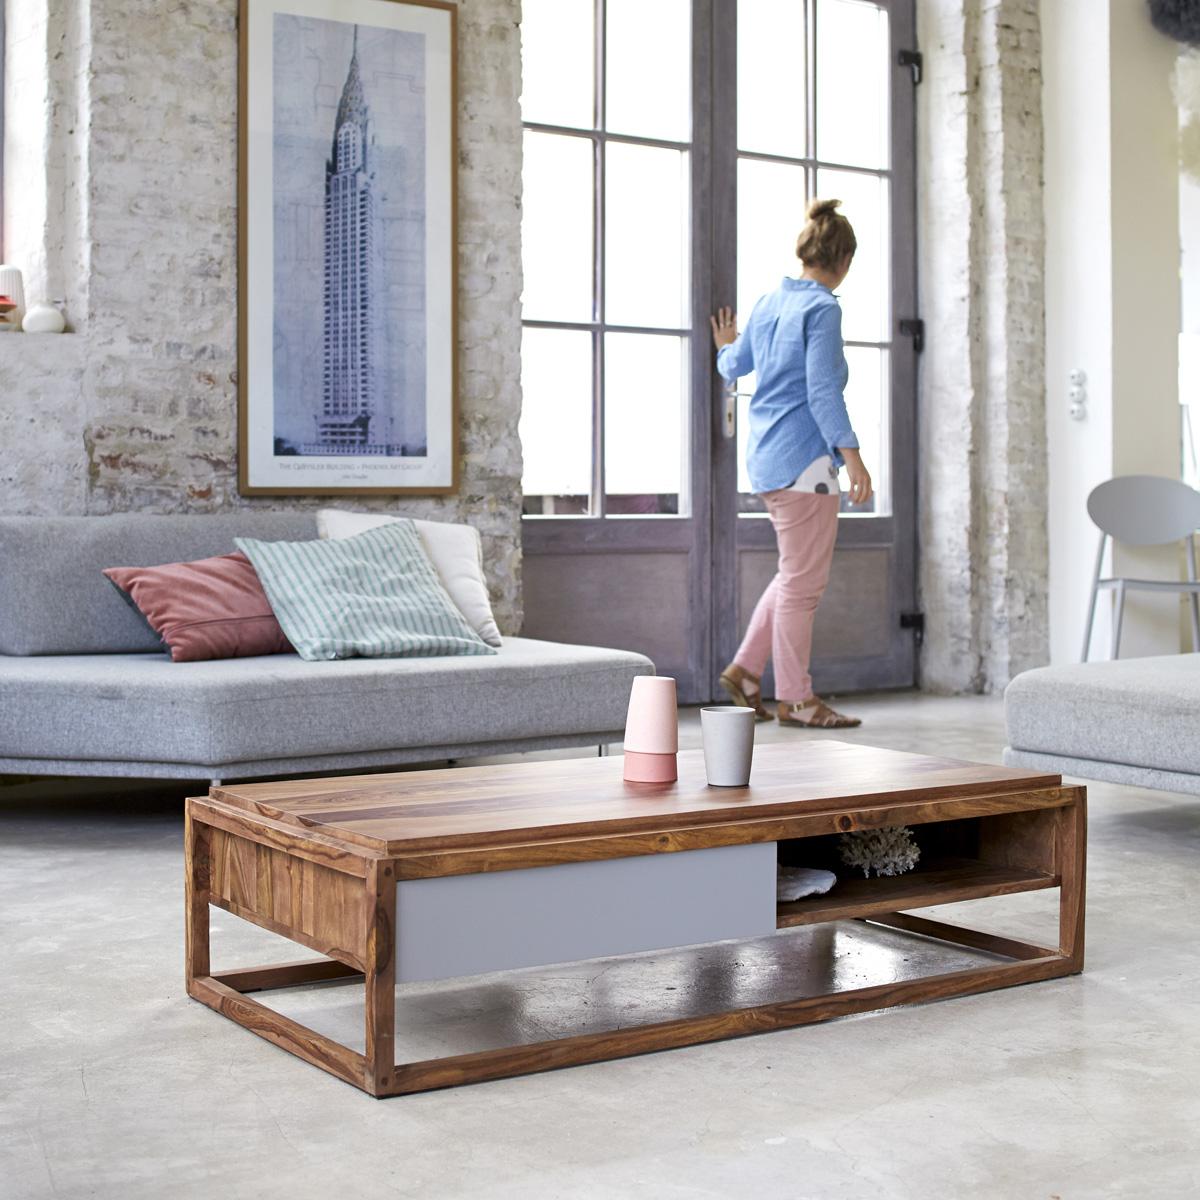 Idee deco table basse scandinave